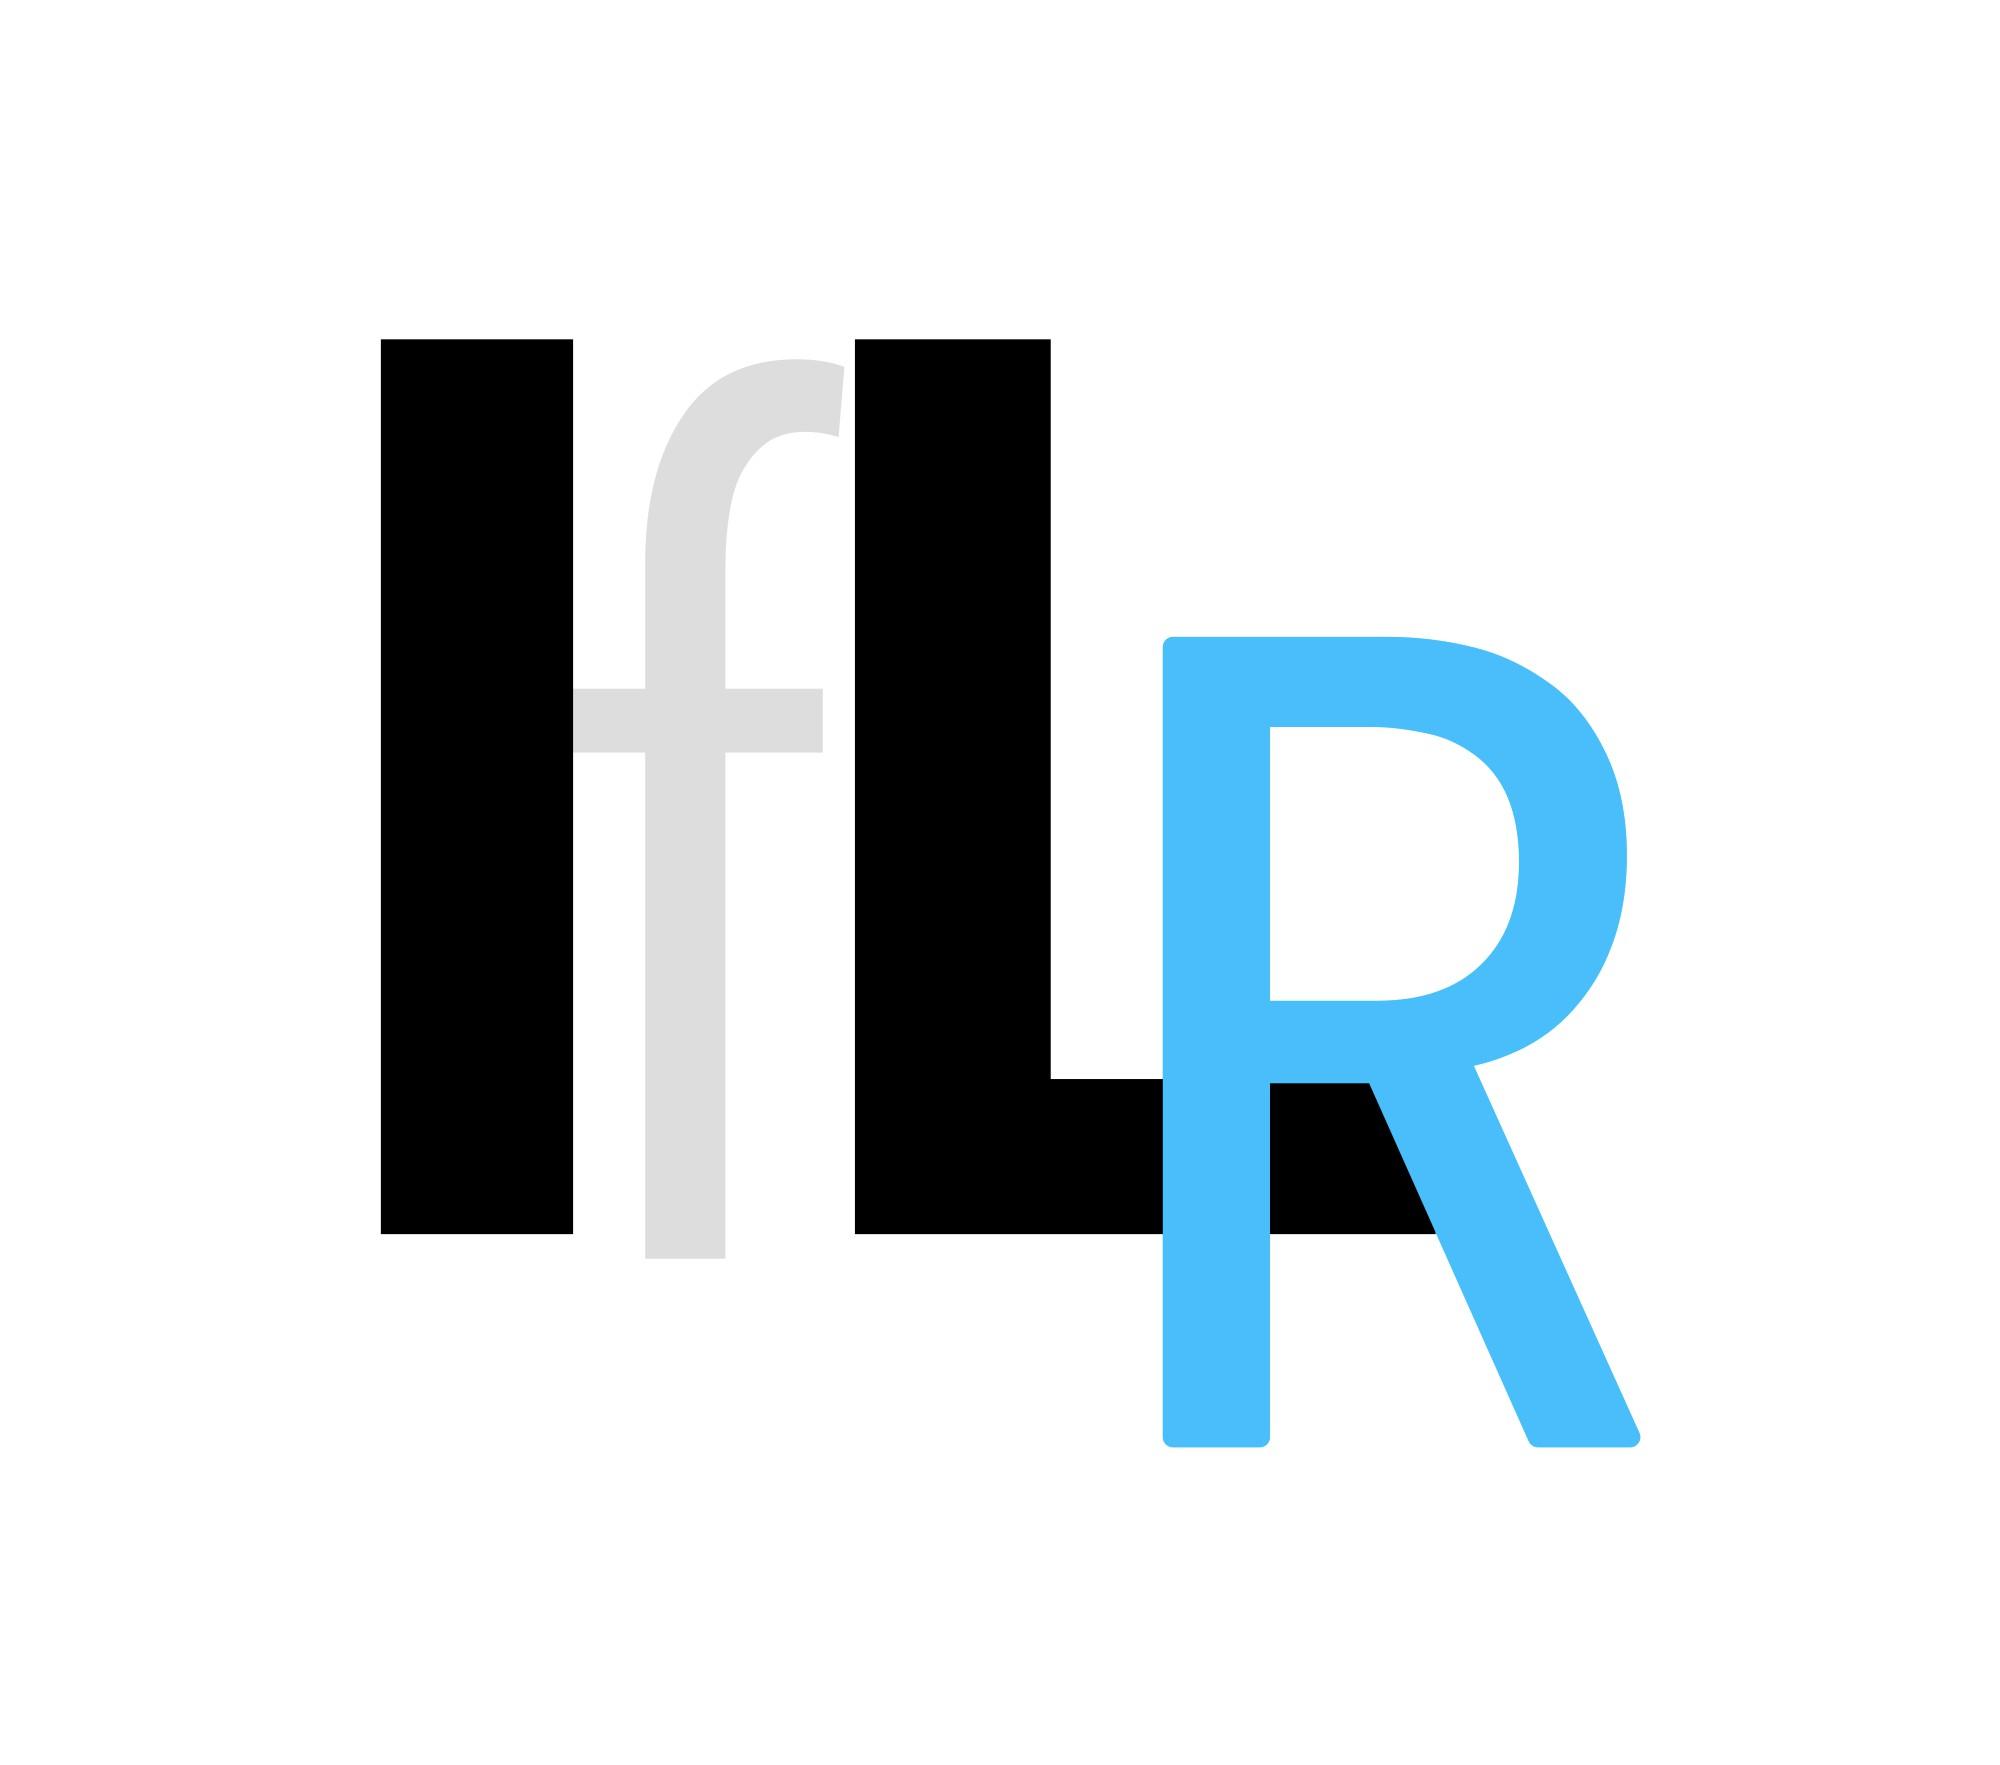 Das Logo des ILR